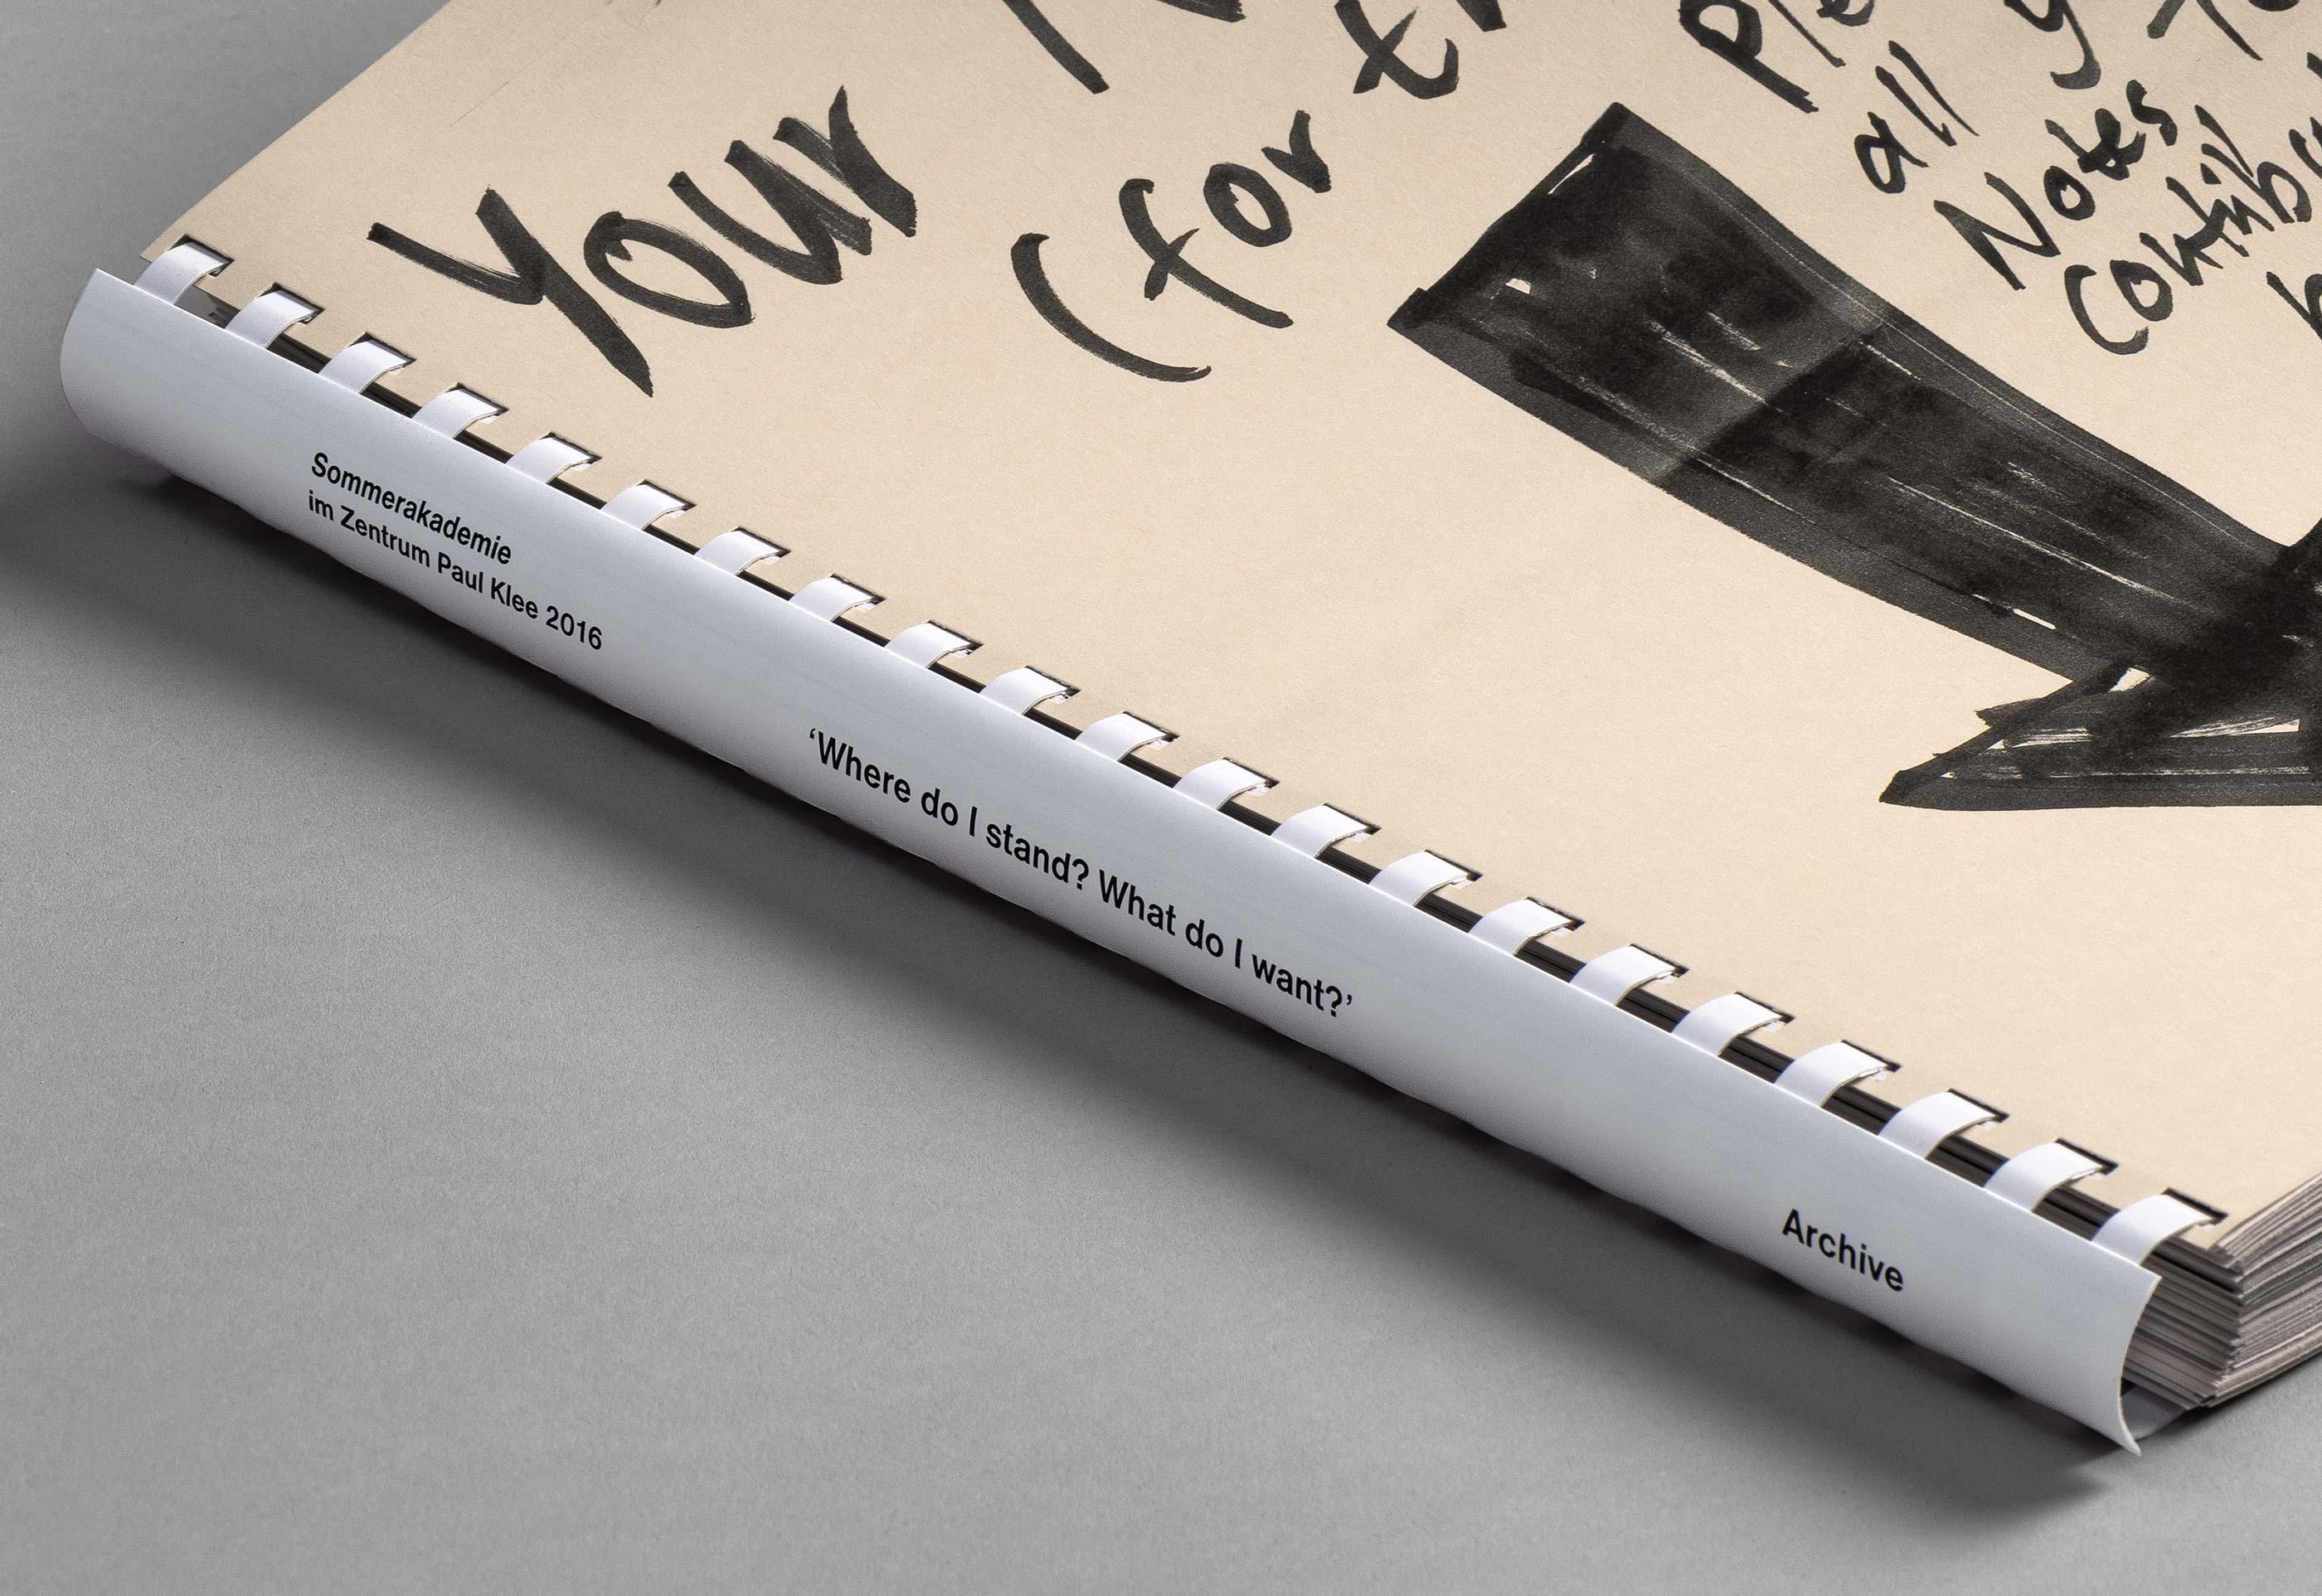 Sommerakademie im Zentrum Paul Klee 2016 – Publikation Thomas Hirschhorn, cover  ©Atelier Pol